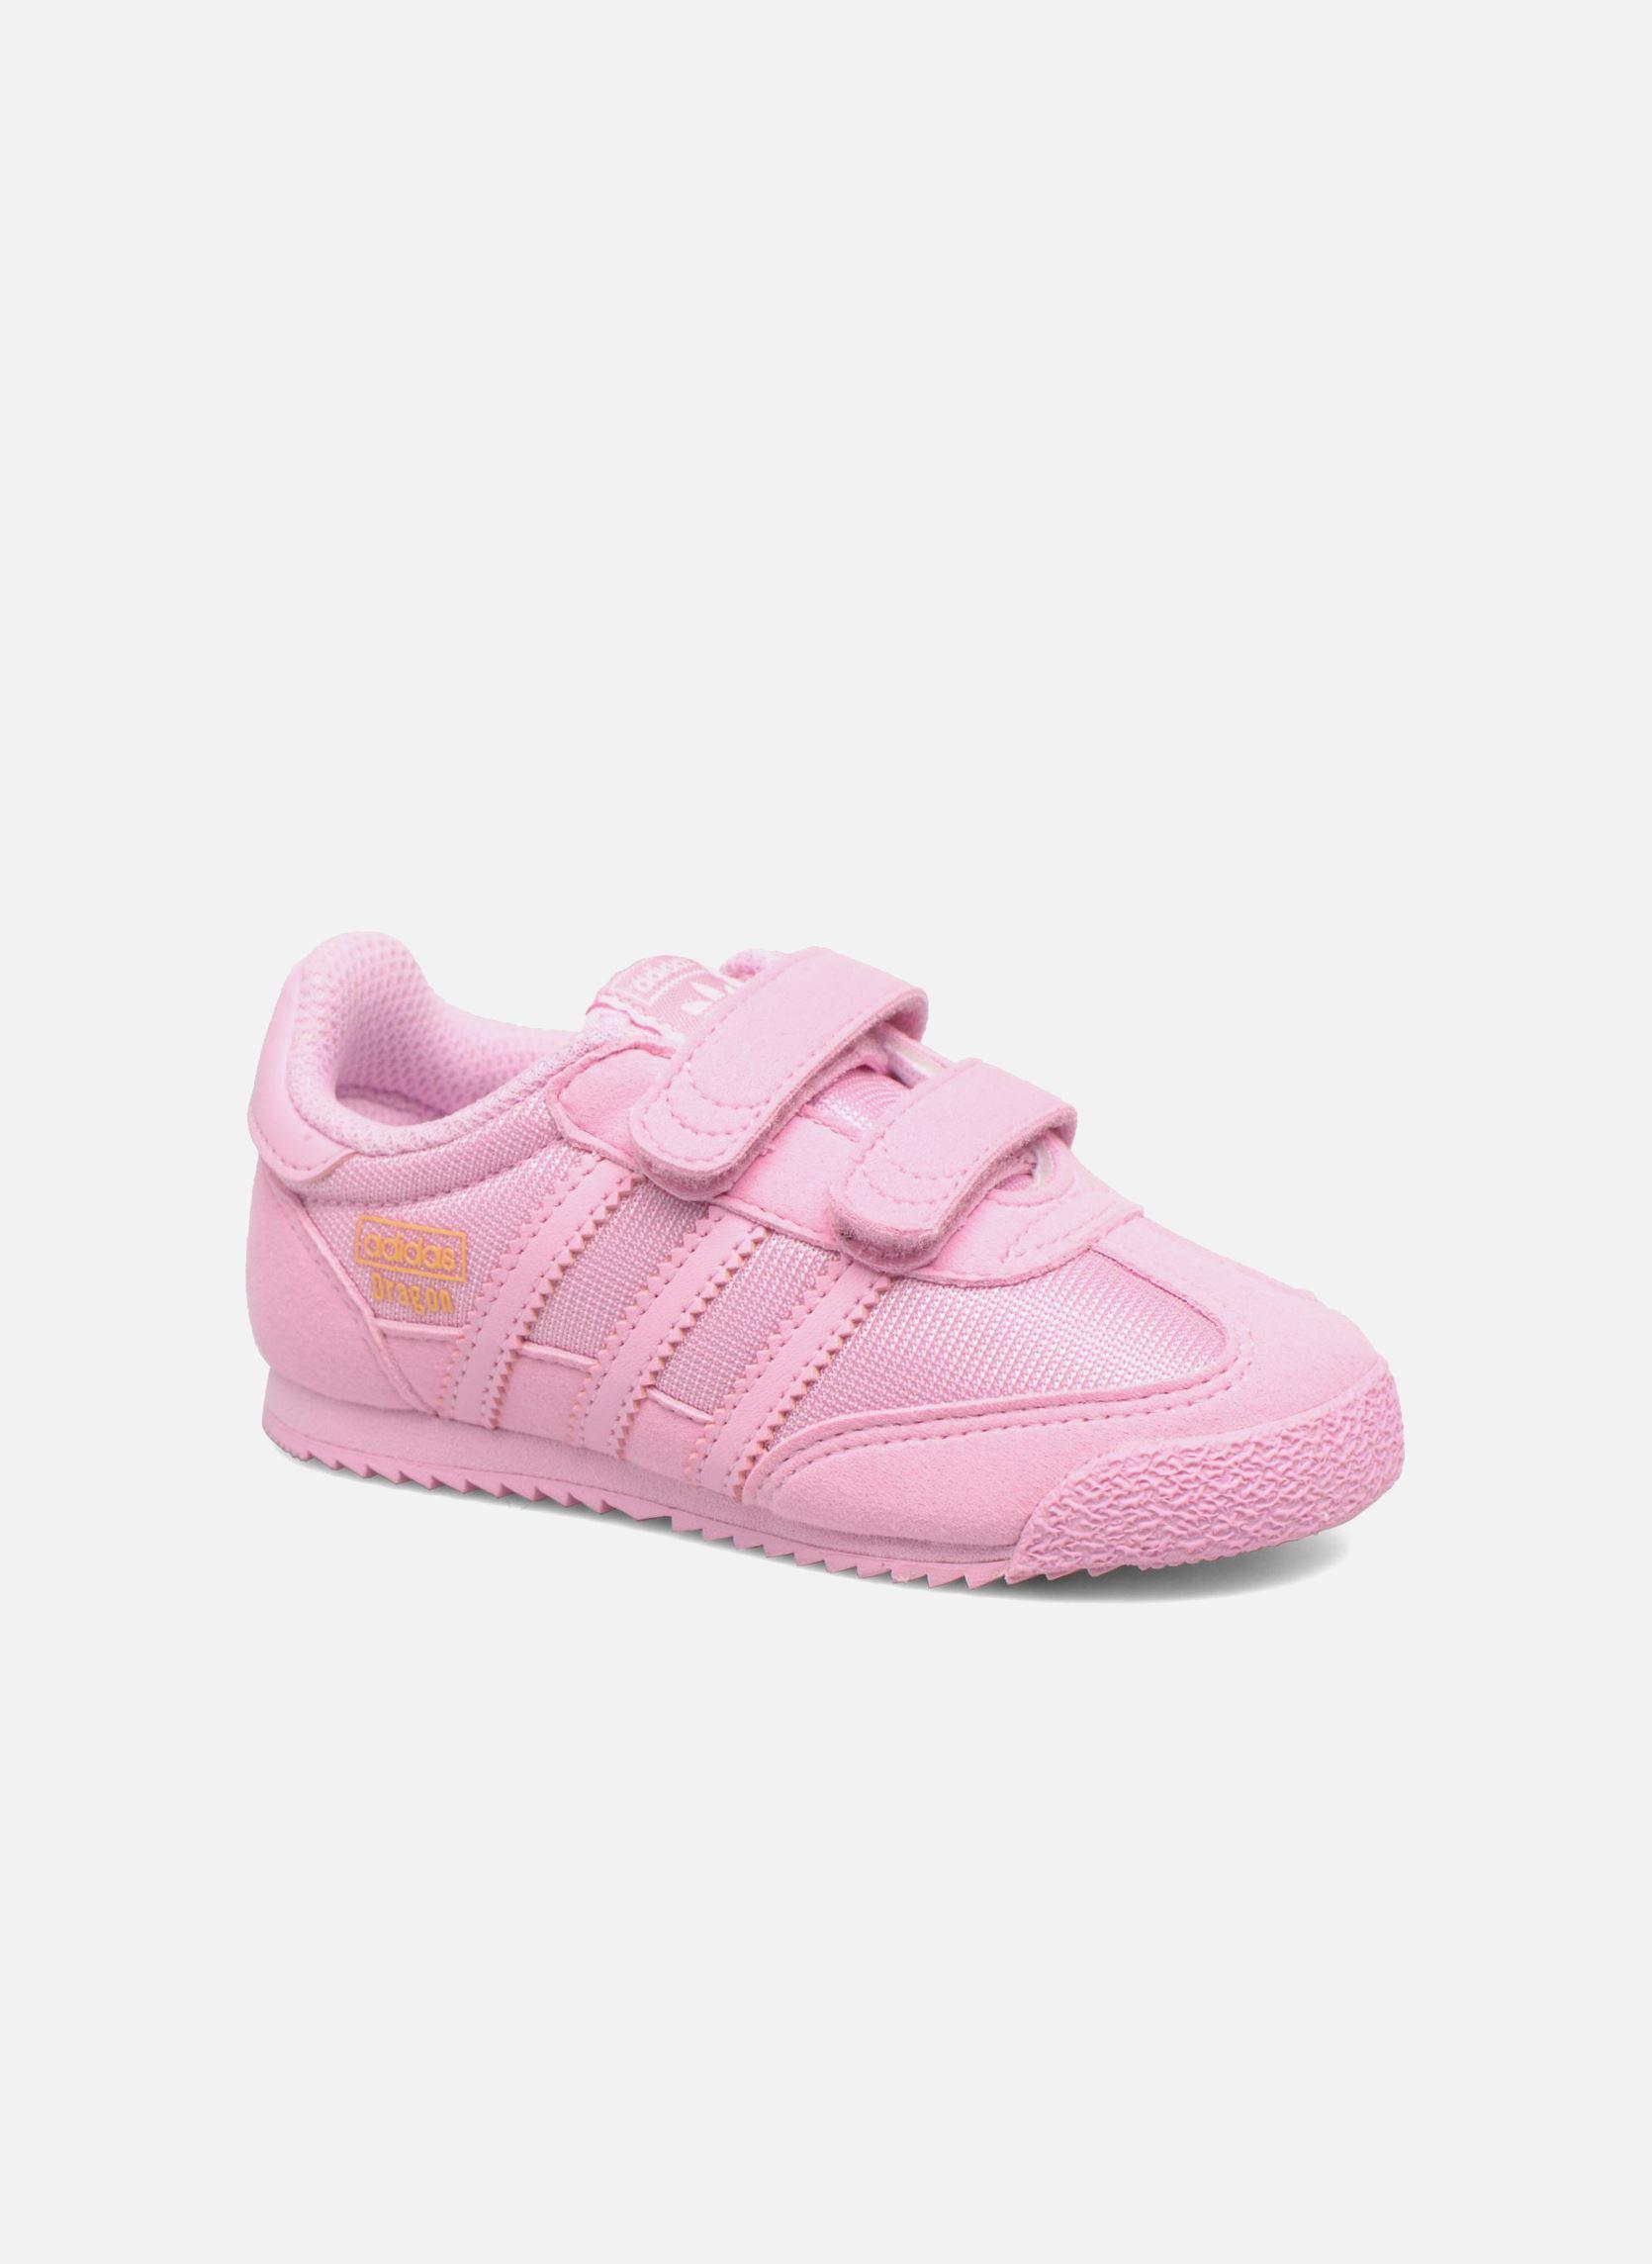 adidas Originals Jan BS 2 Mid I Gris Rose Chaussures Basket